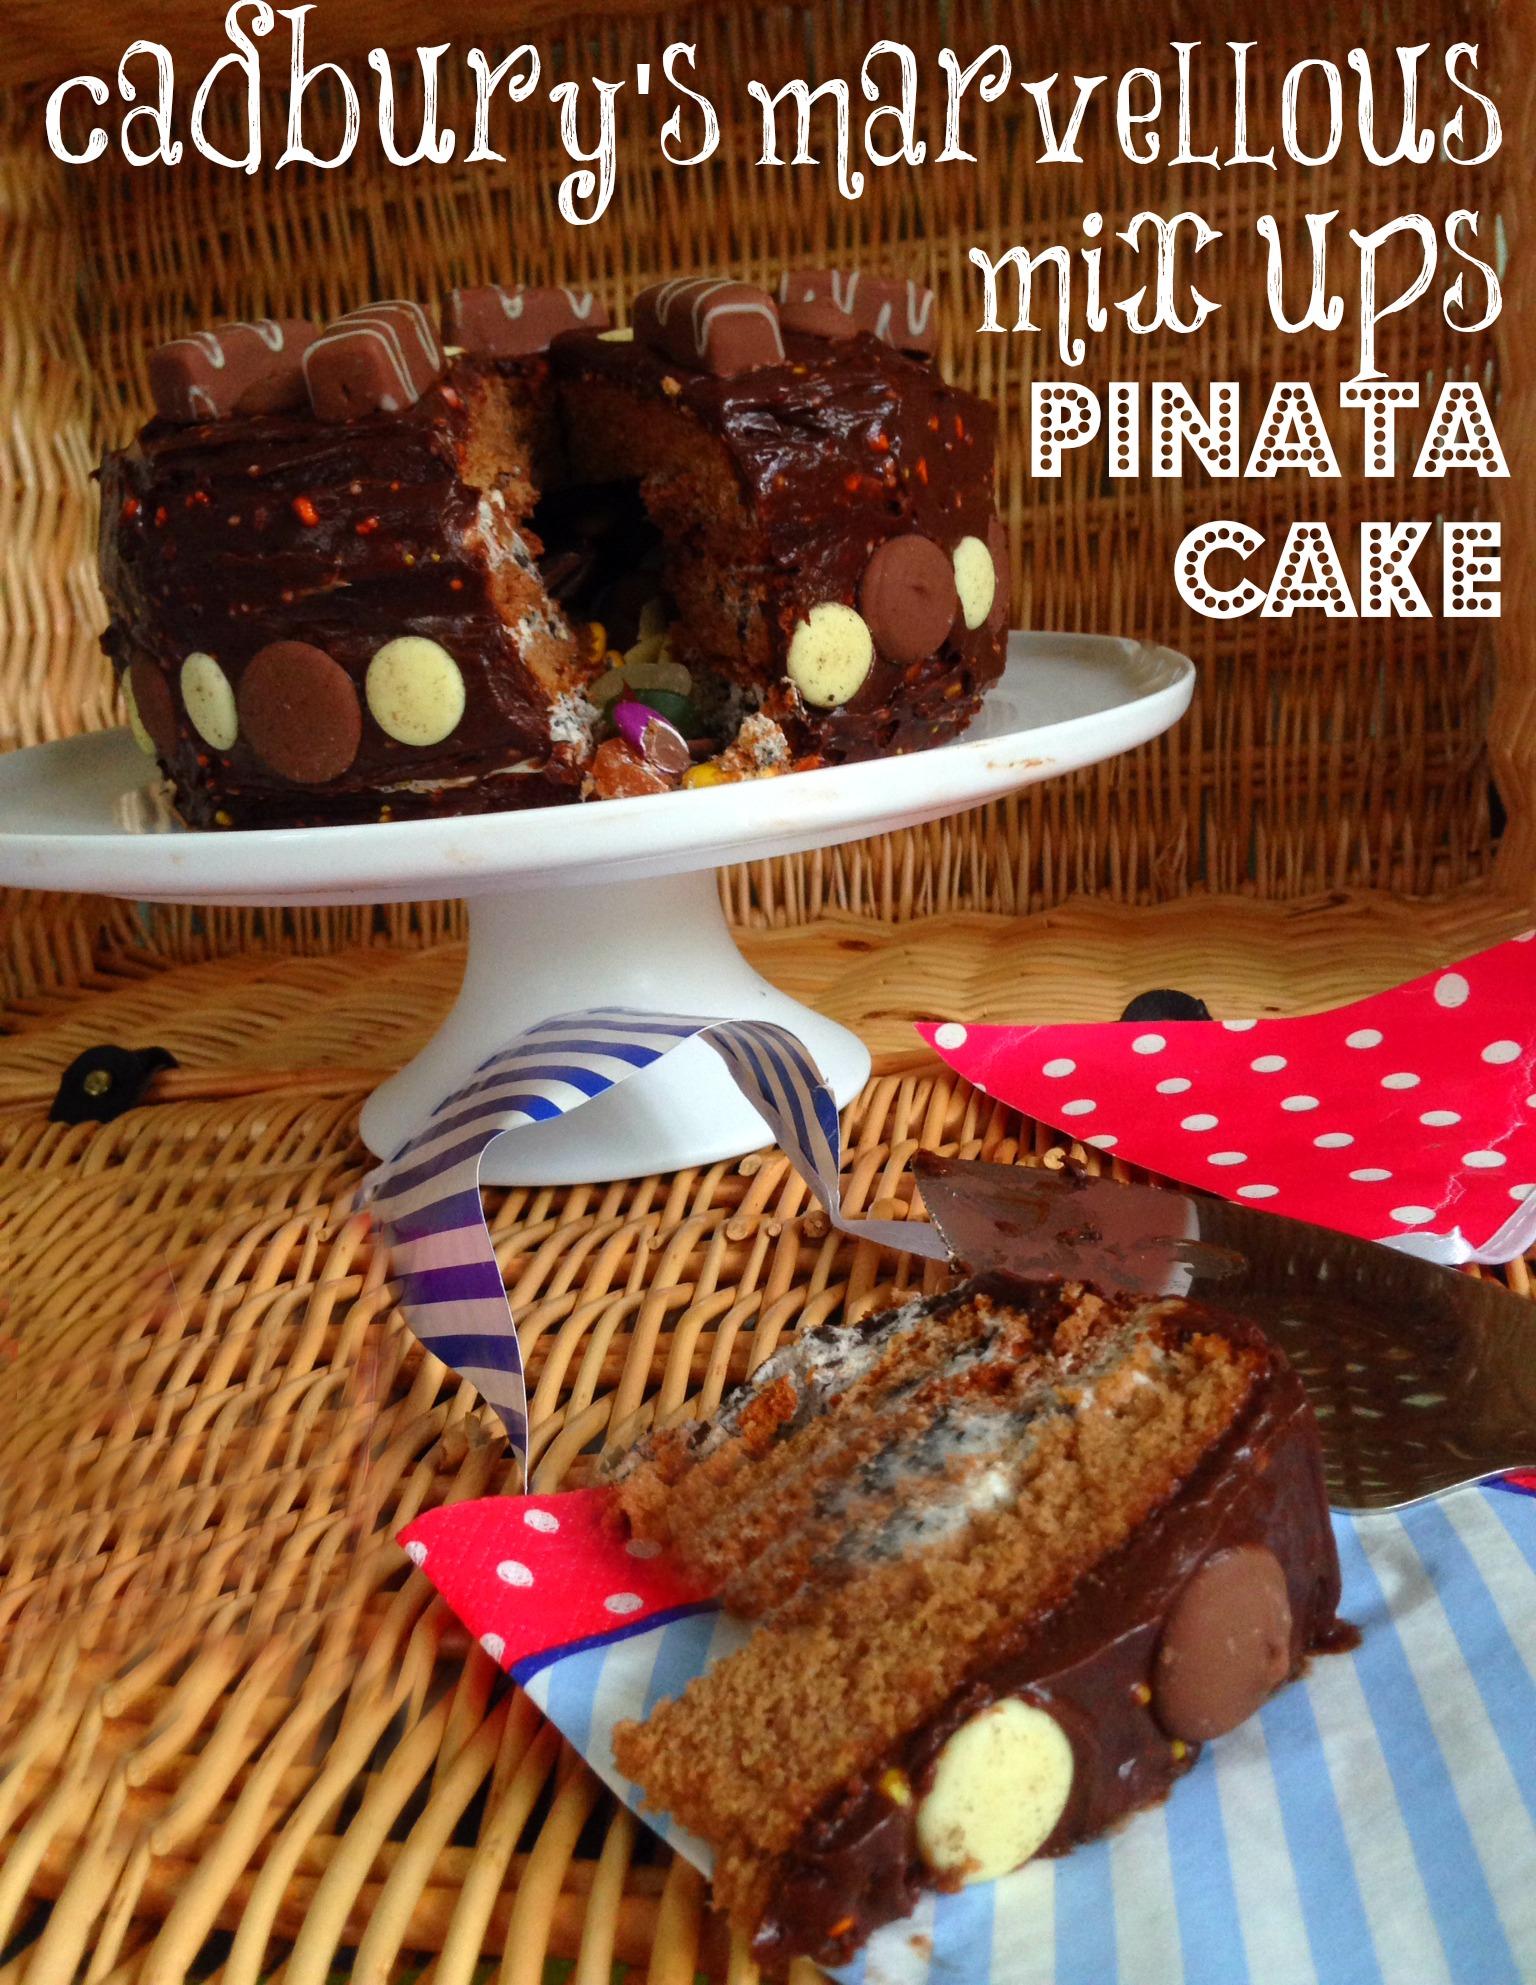 Cadbury S Marvellous Mix Ups Pinata Cake Freethejoy